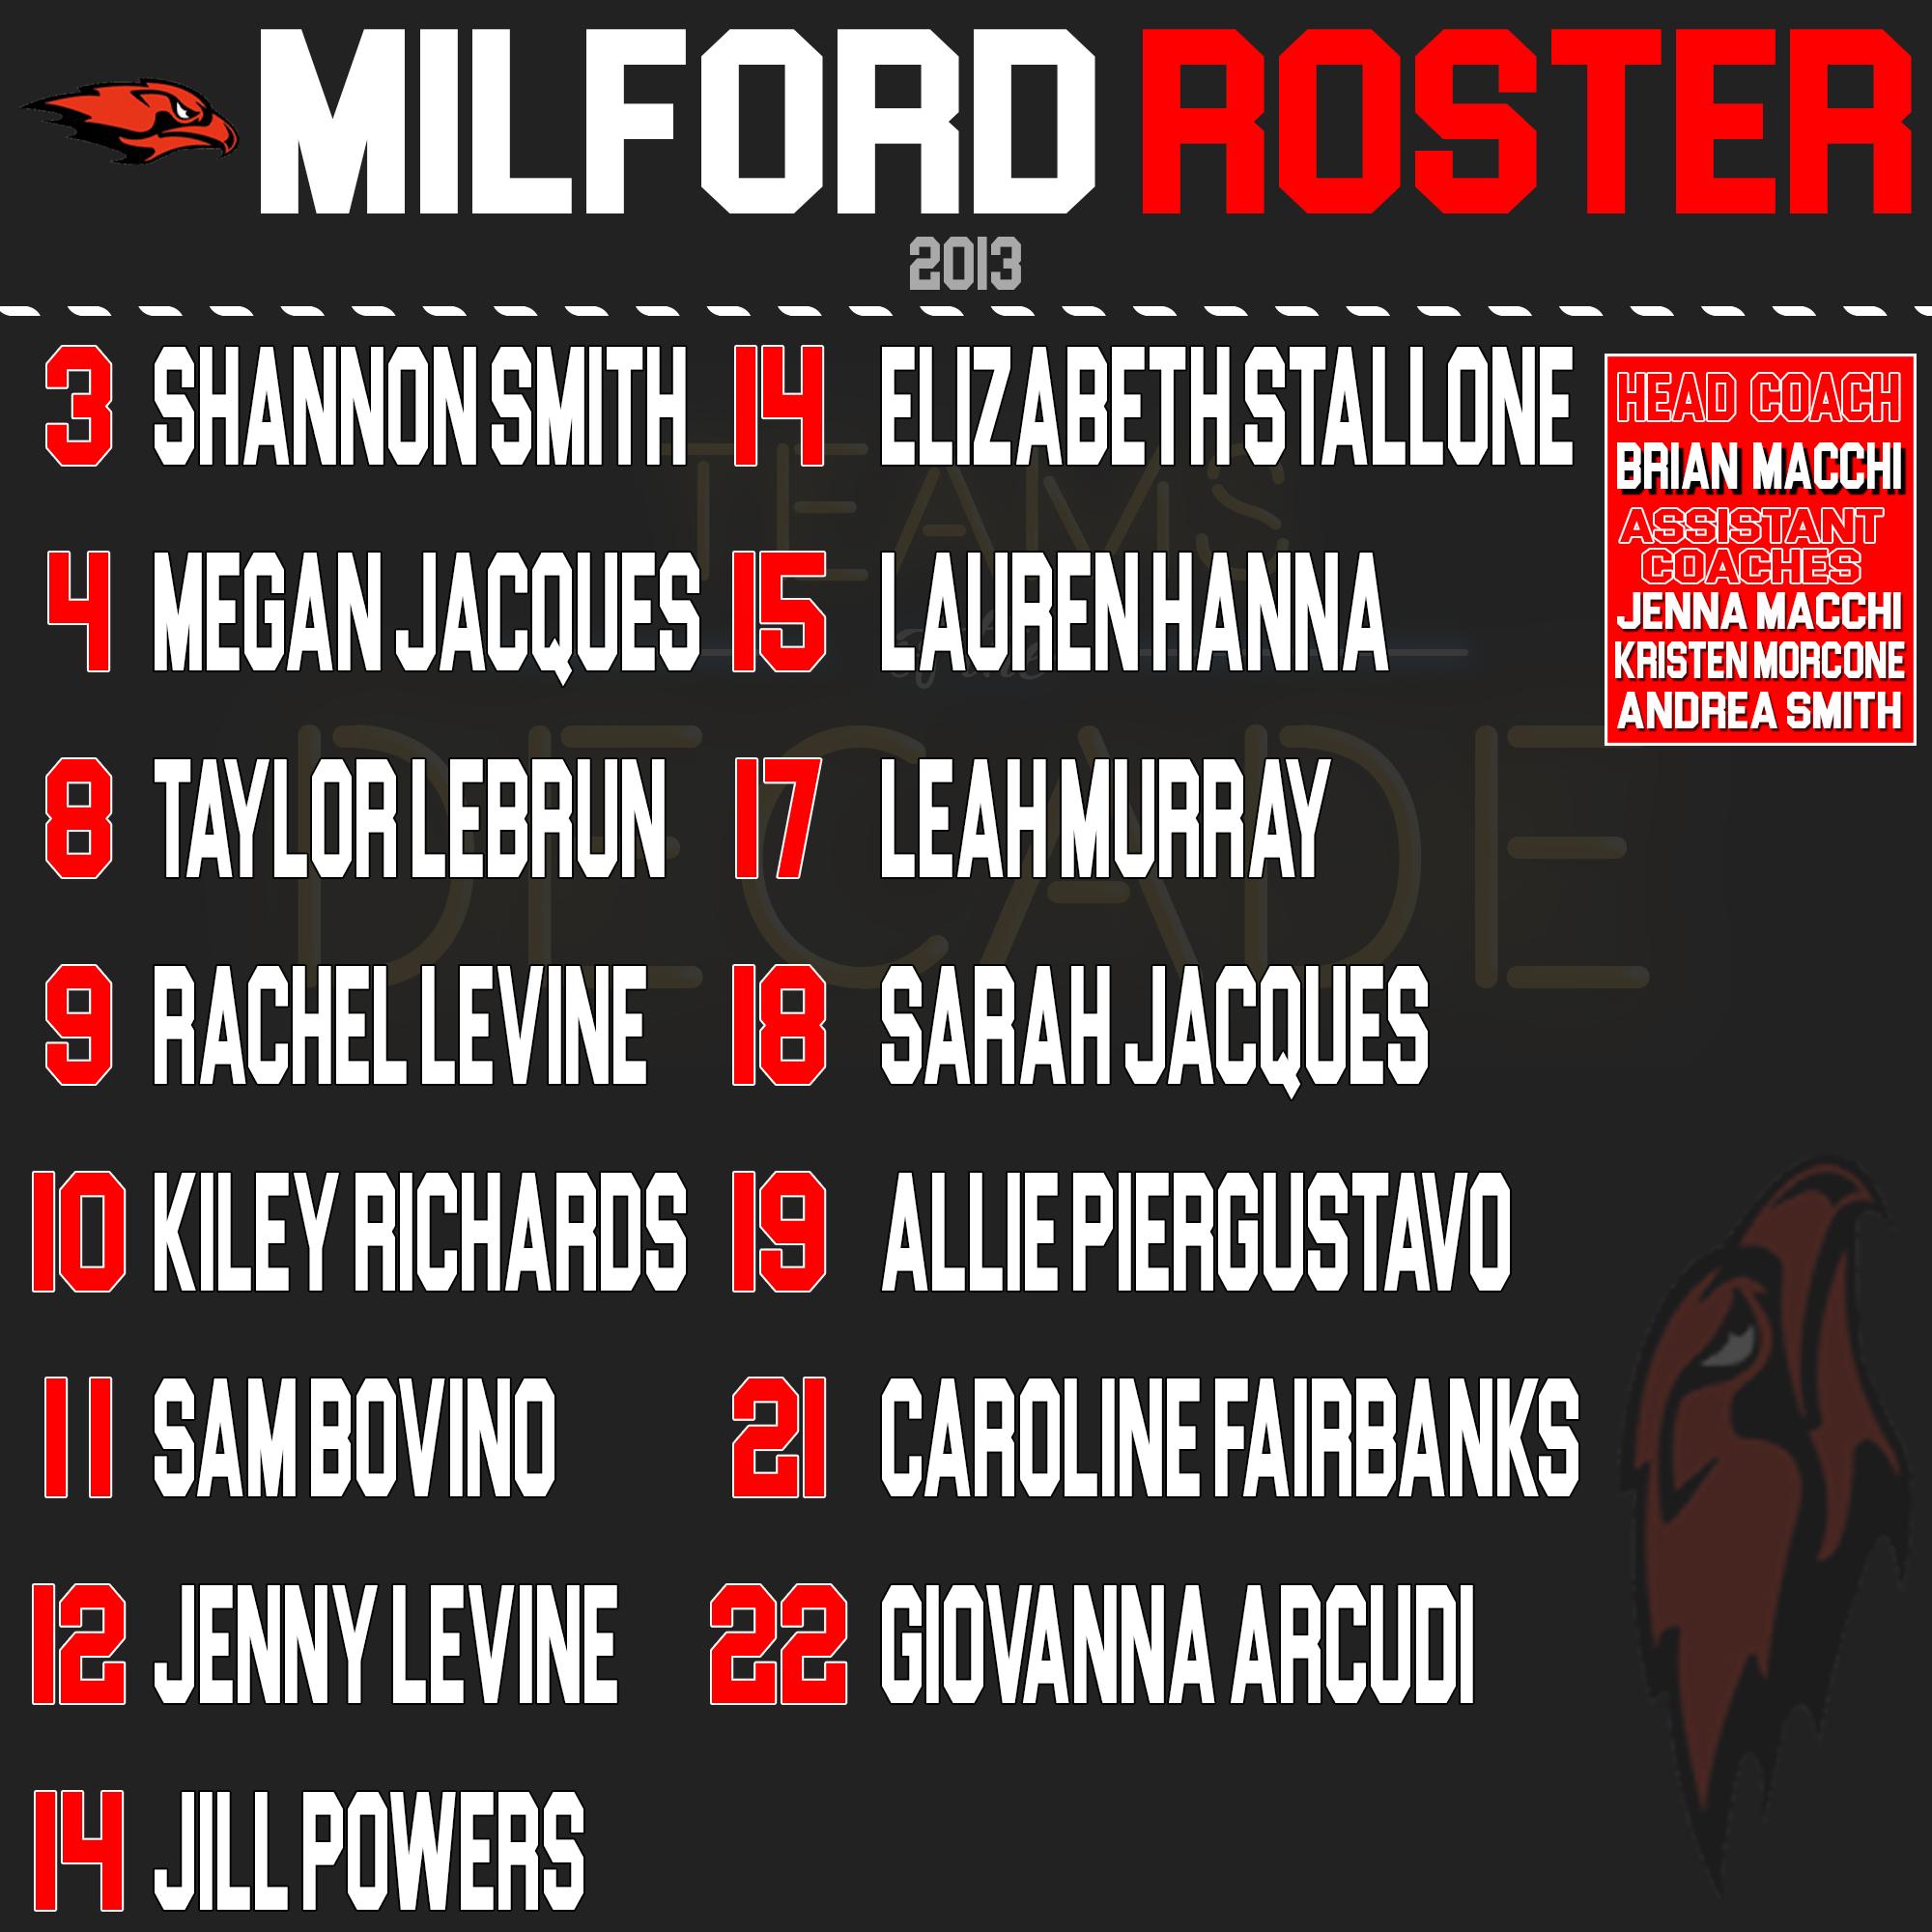 Milford softball